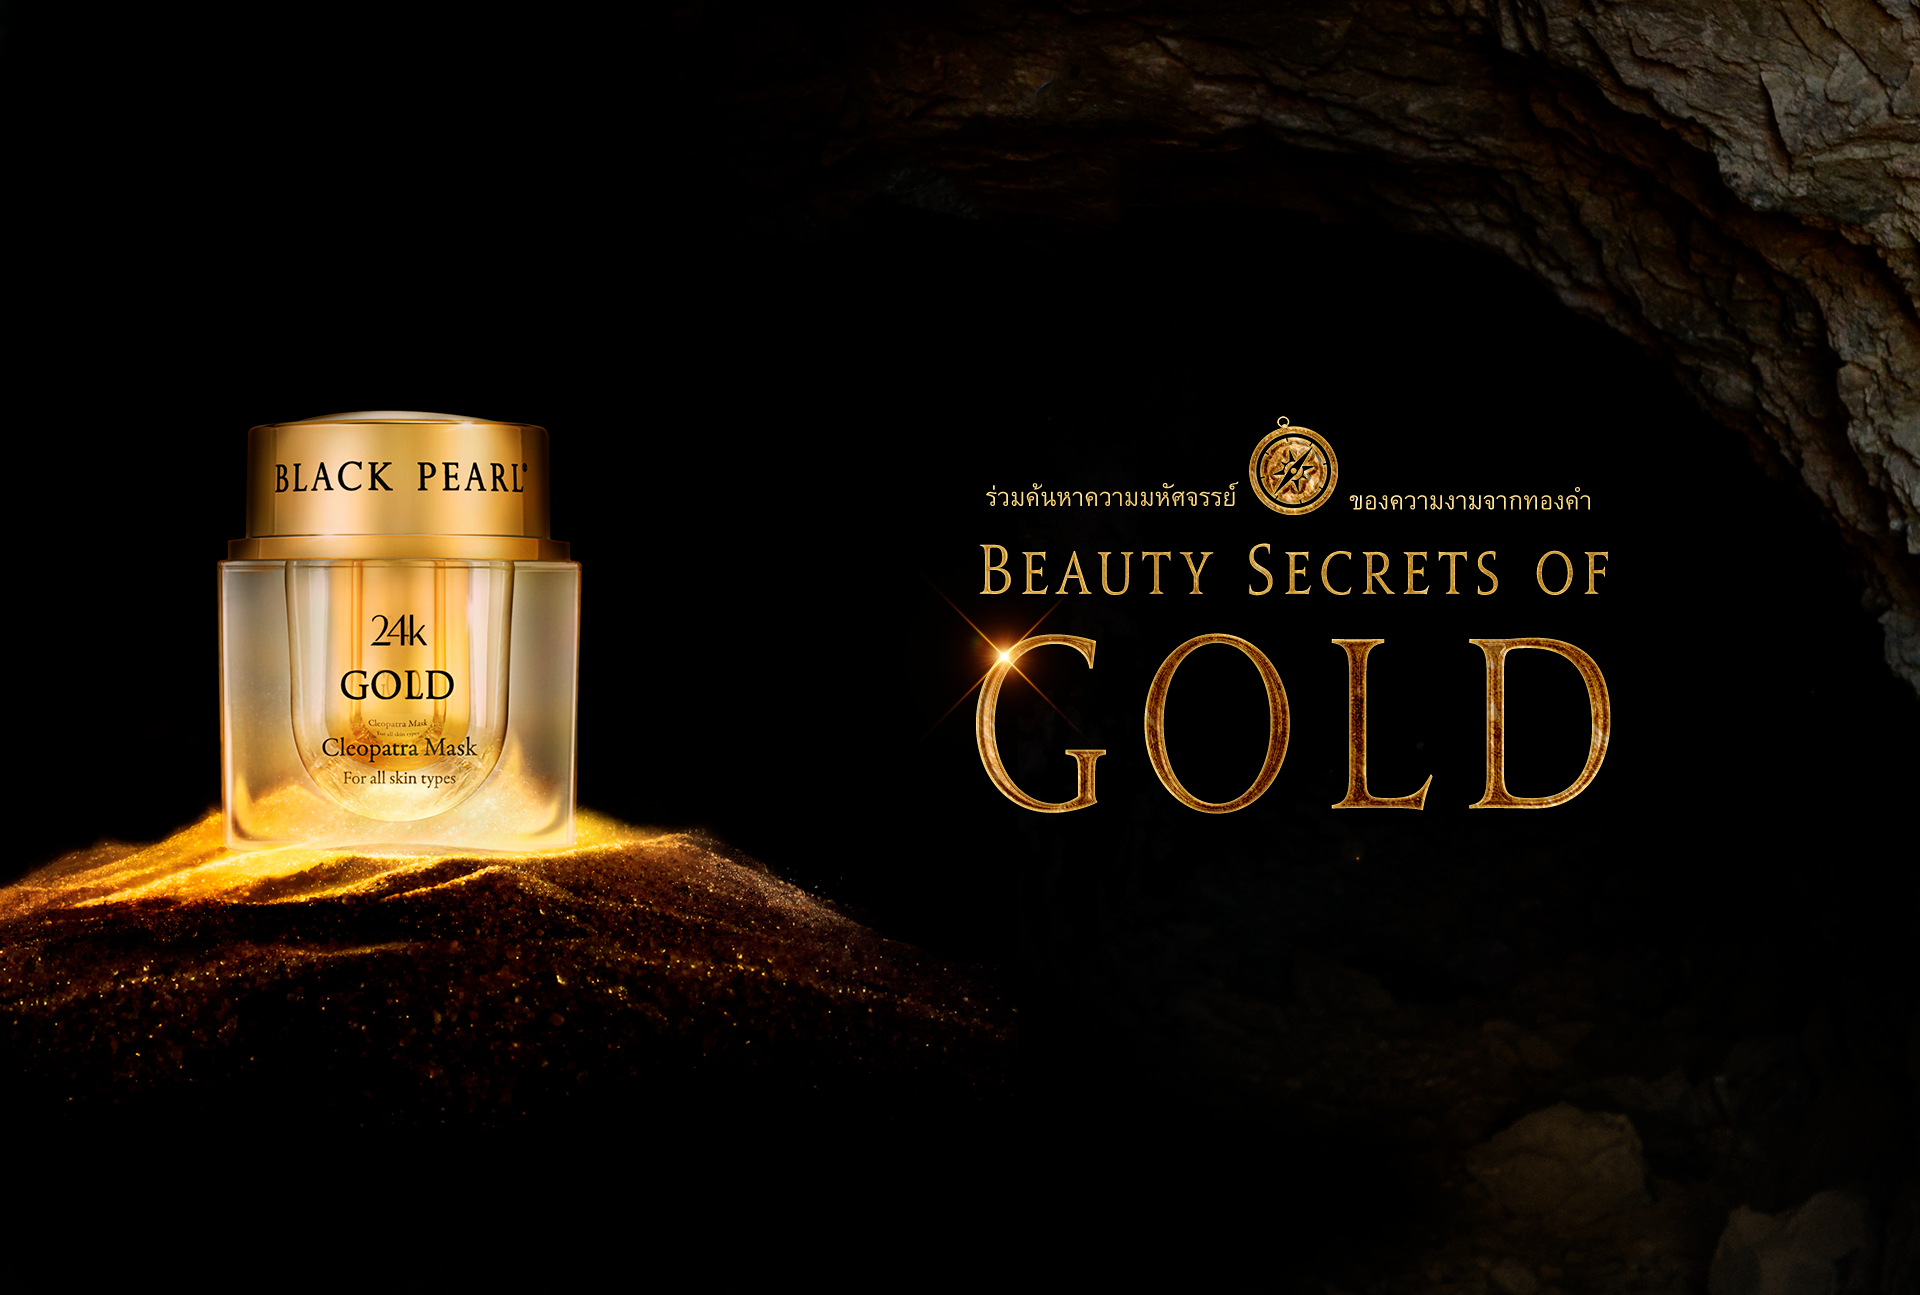 Beauty Secrets of Gold